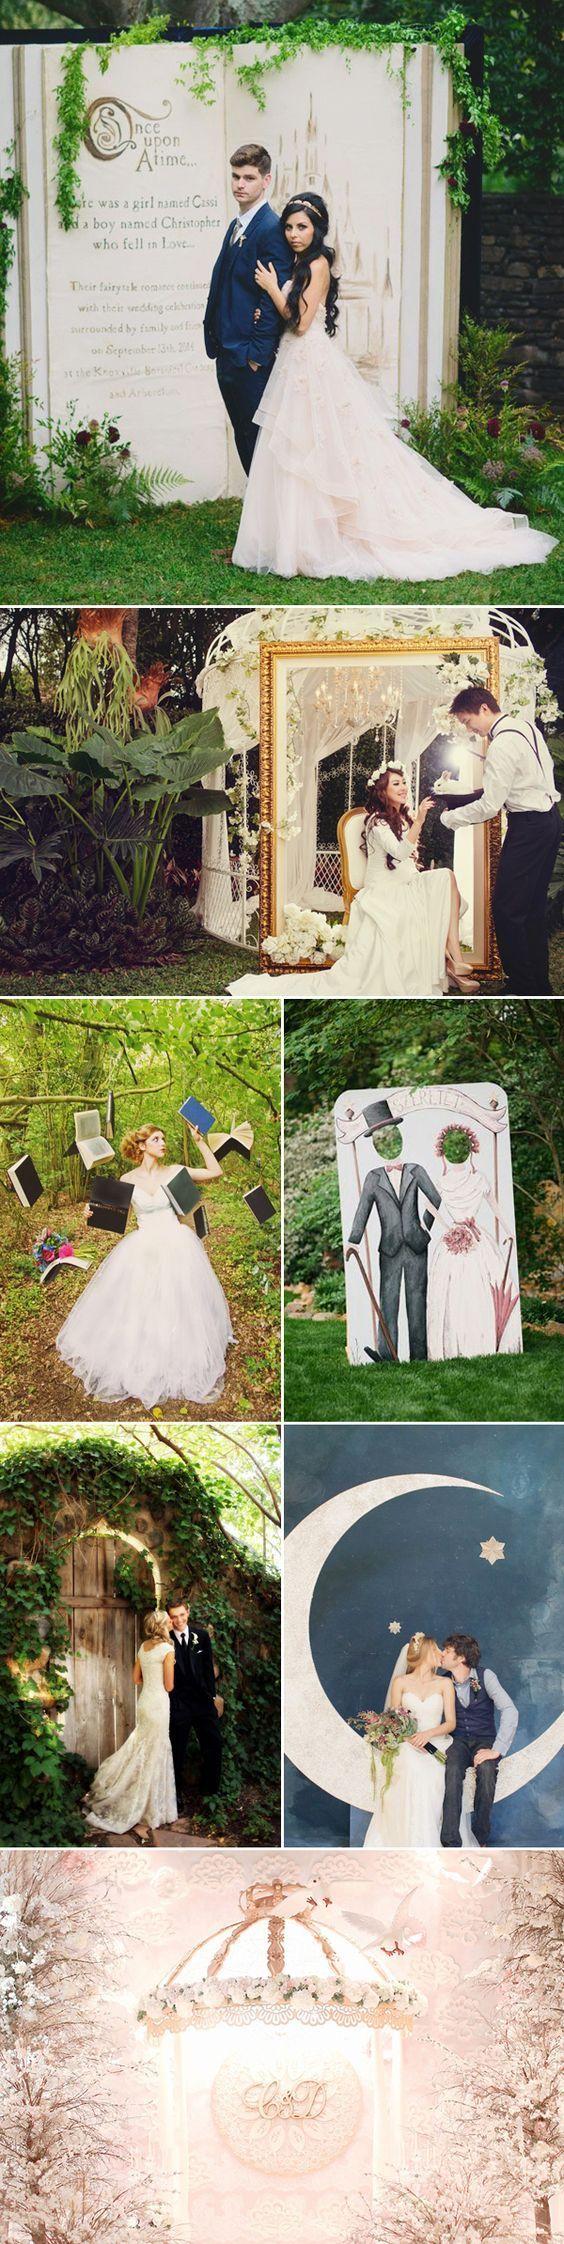 Creative Wedding Photo Backdrops. #wedding #cocomelody